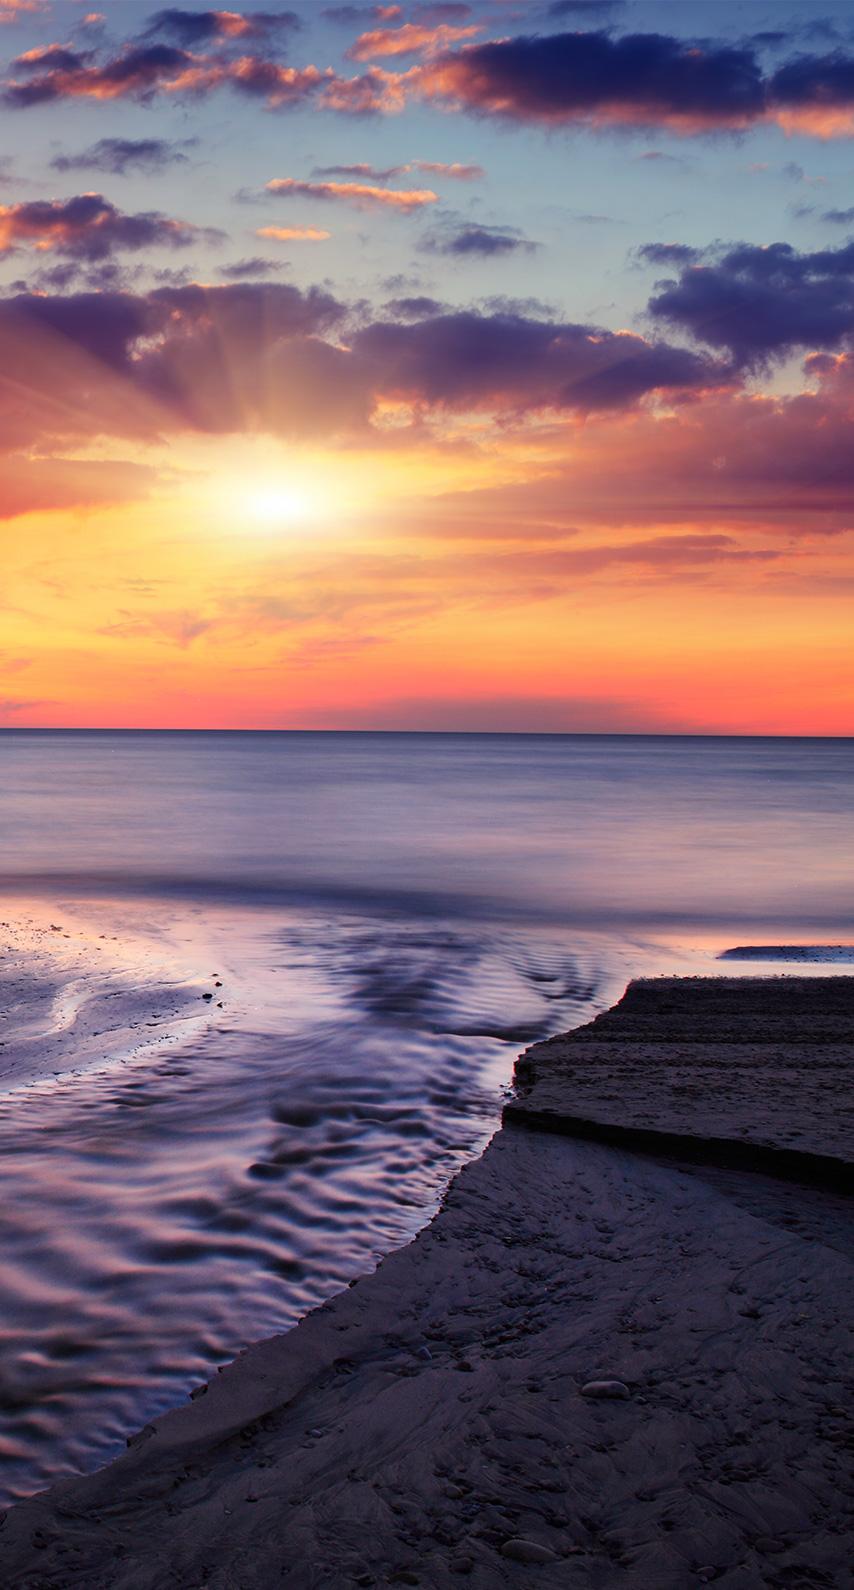 evening, sun, no person, dawn, fair weather, dusk, surf, seascape, seashore